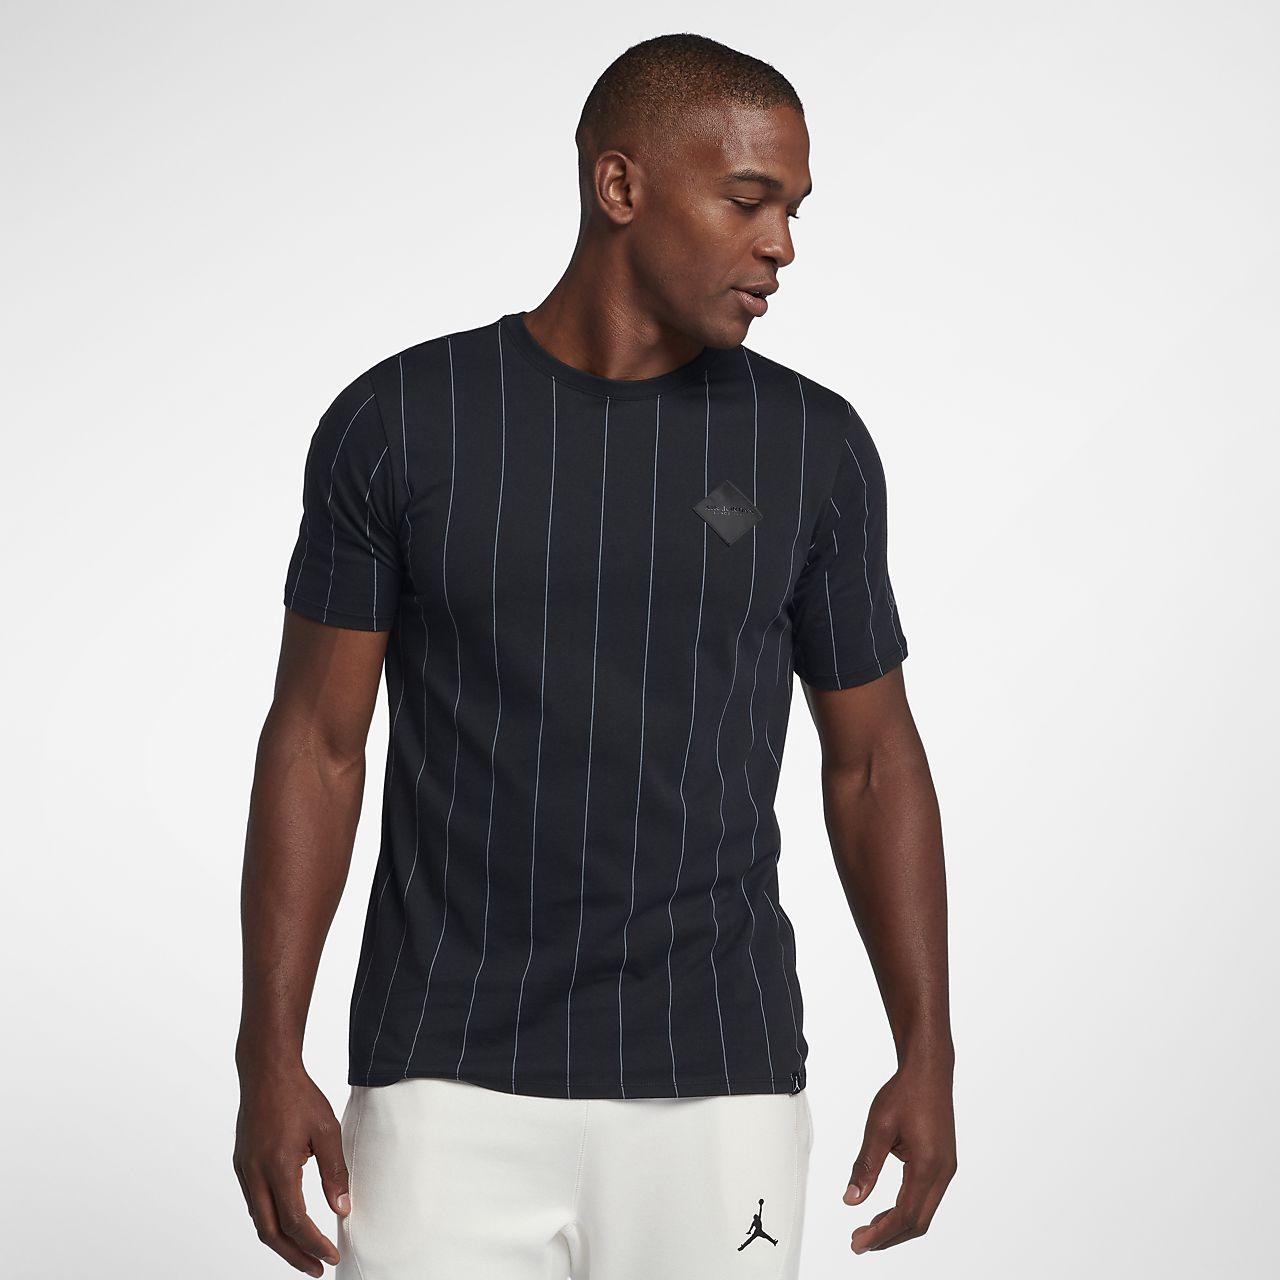 Jordan Lifestyle AJ 9 Men's T-Shirt